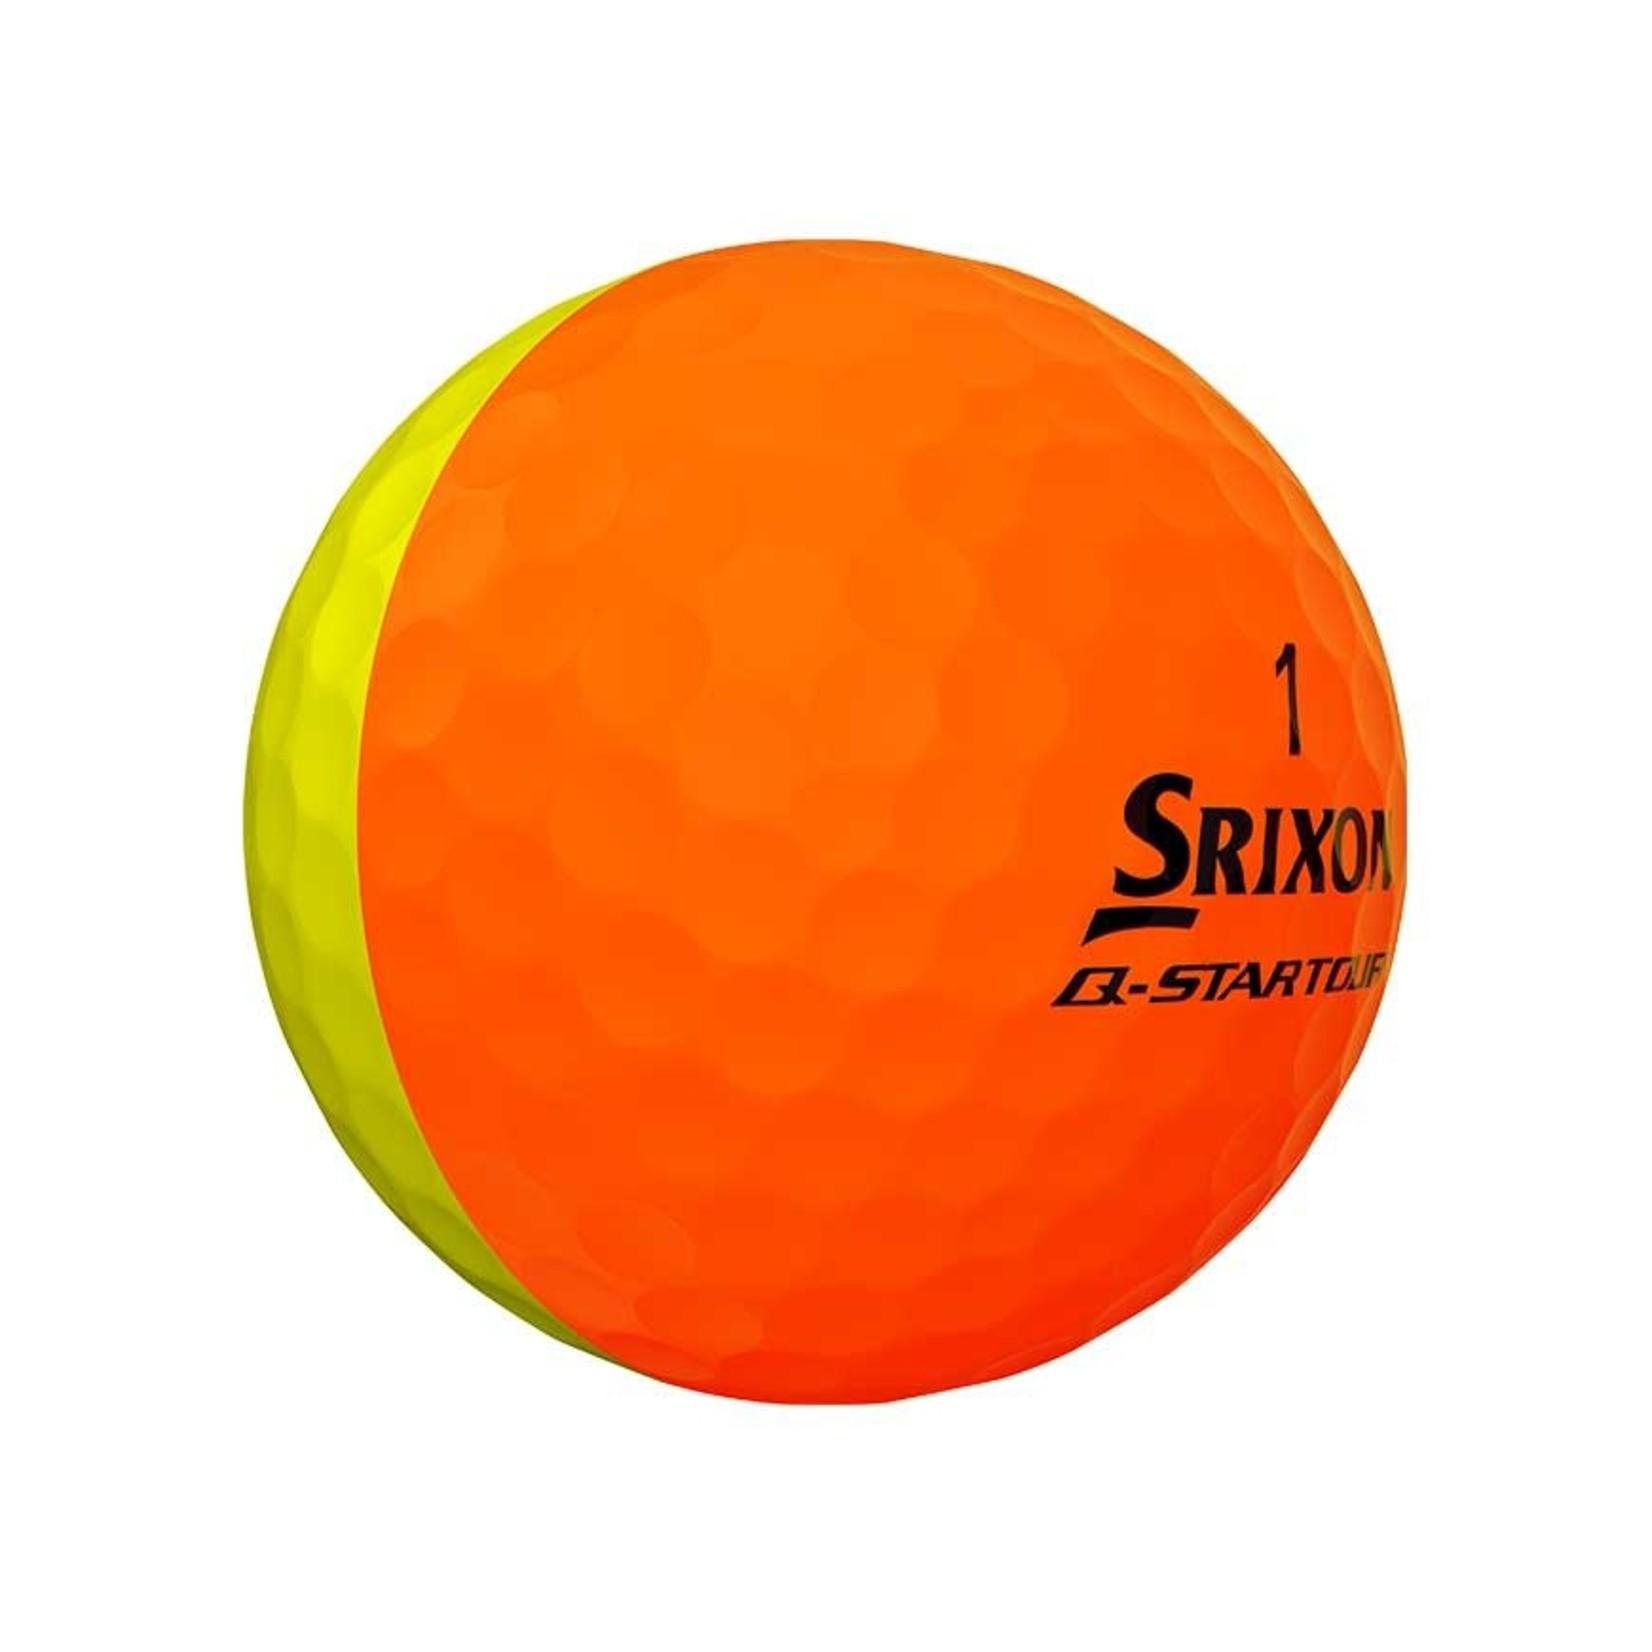 Srixon Srixon Q-star Tour Divide Yellow/Orange